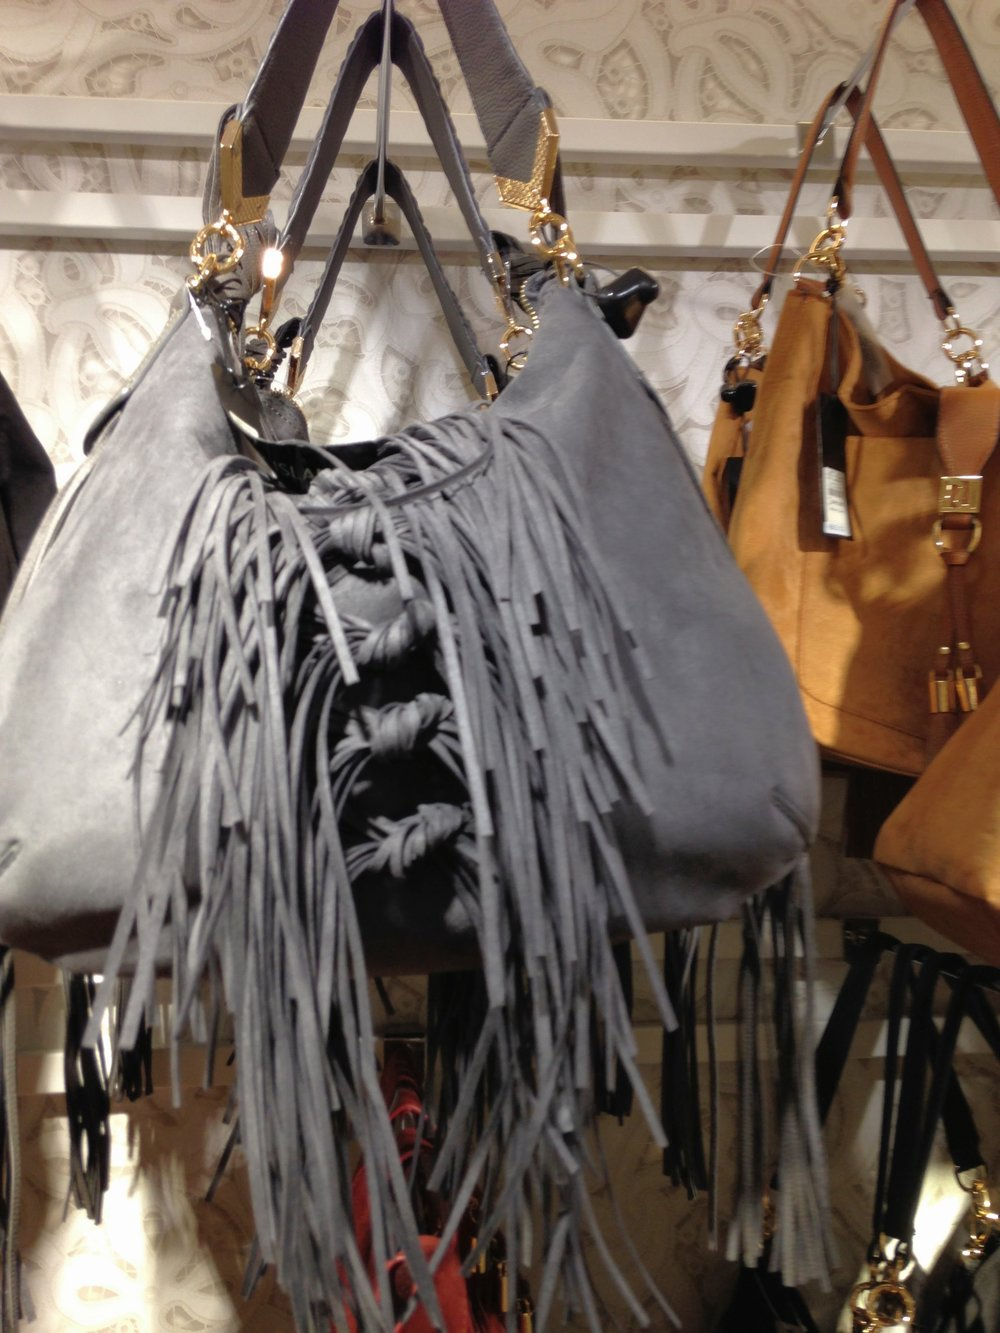 RI Fringe Bag